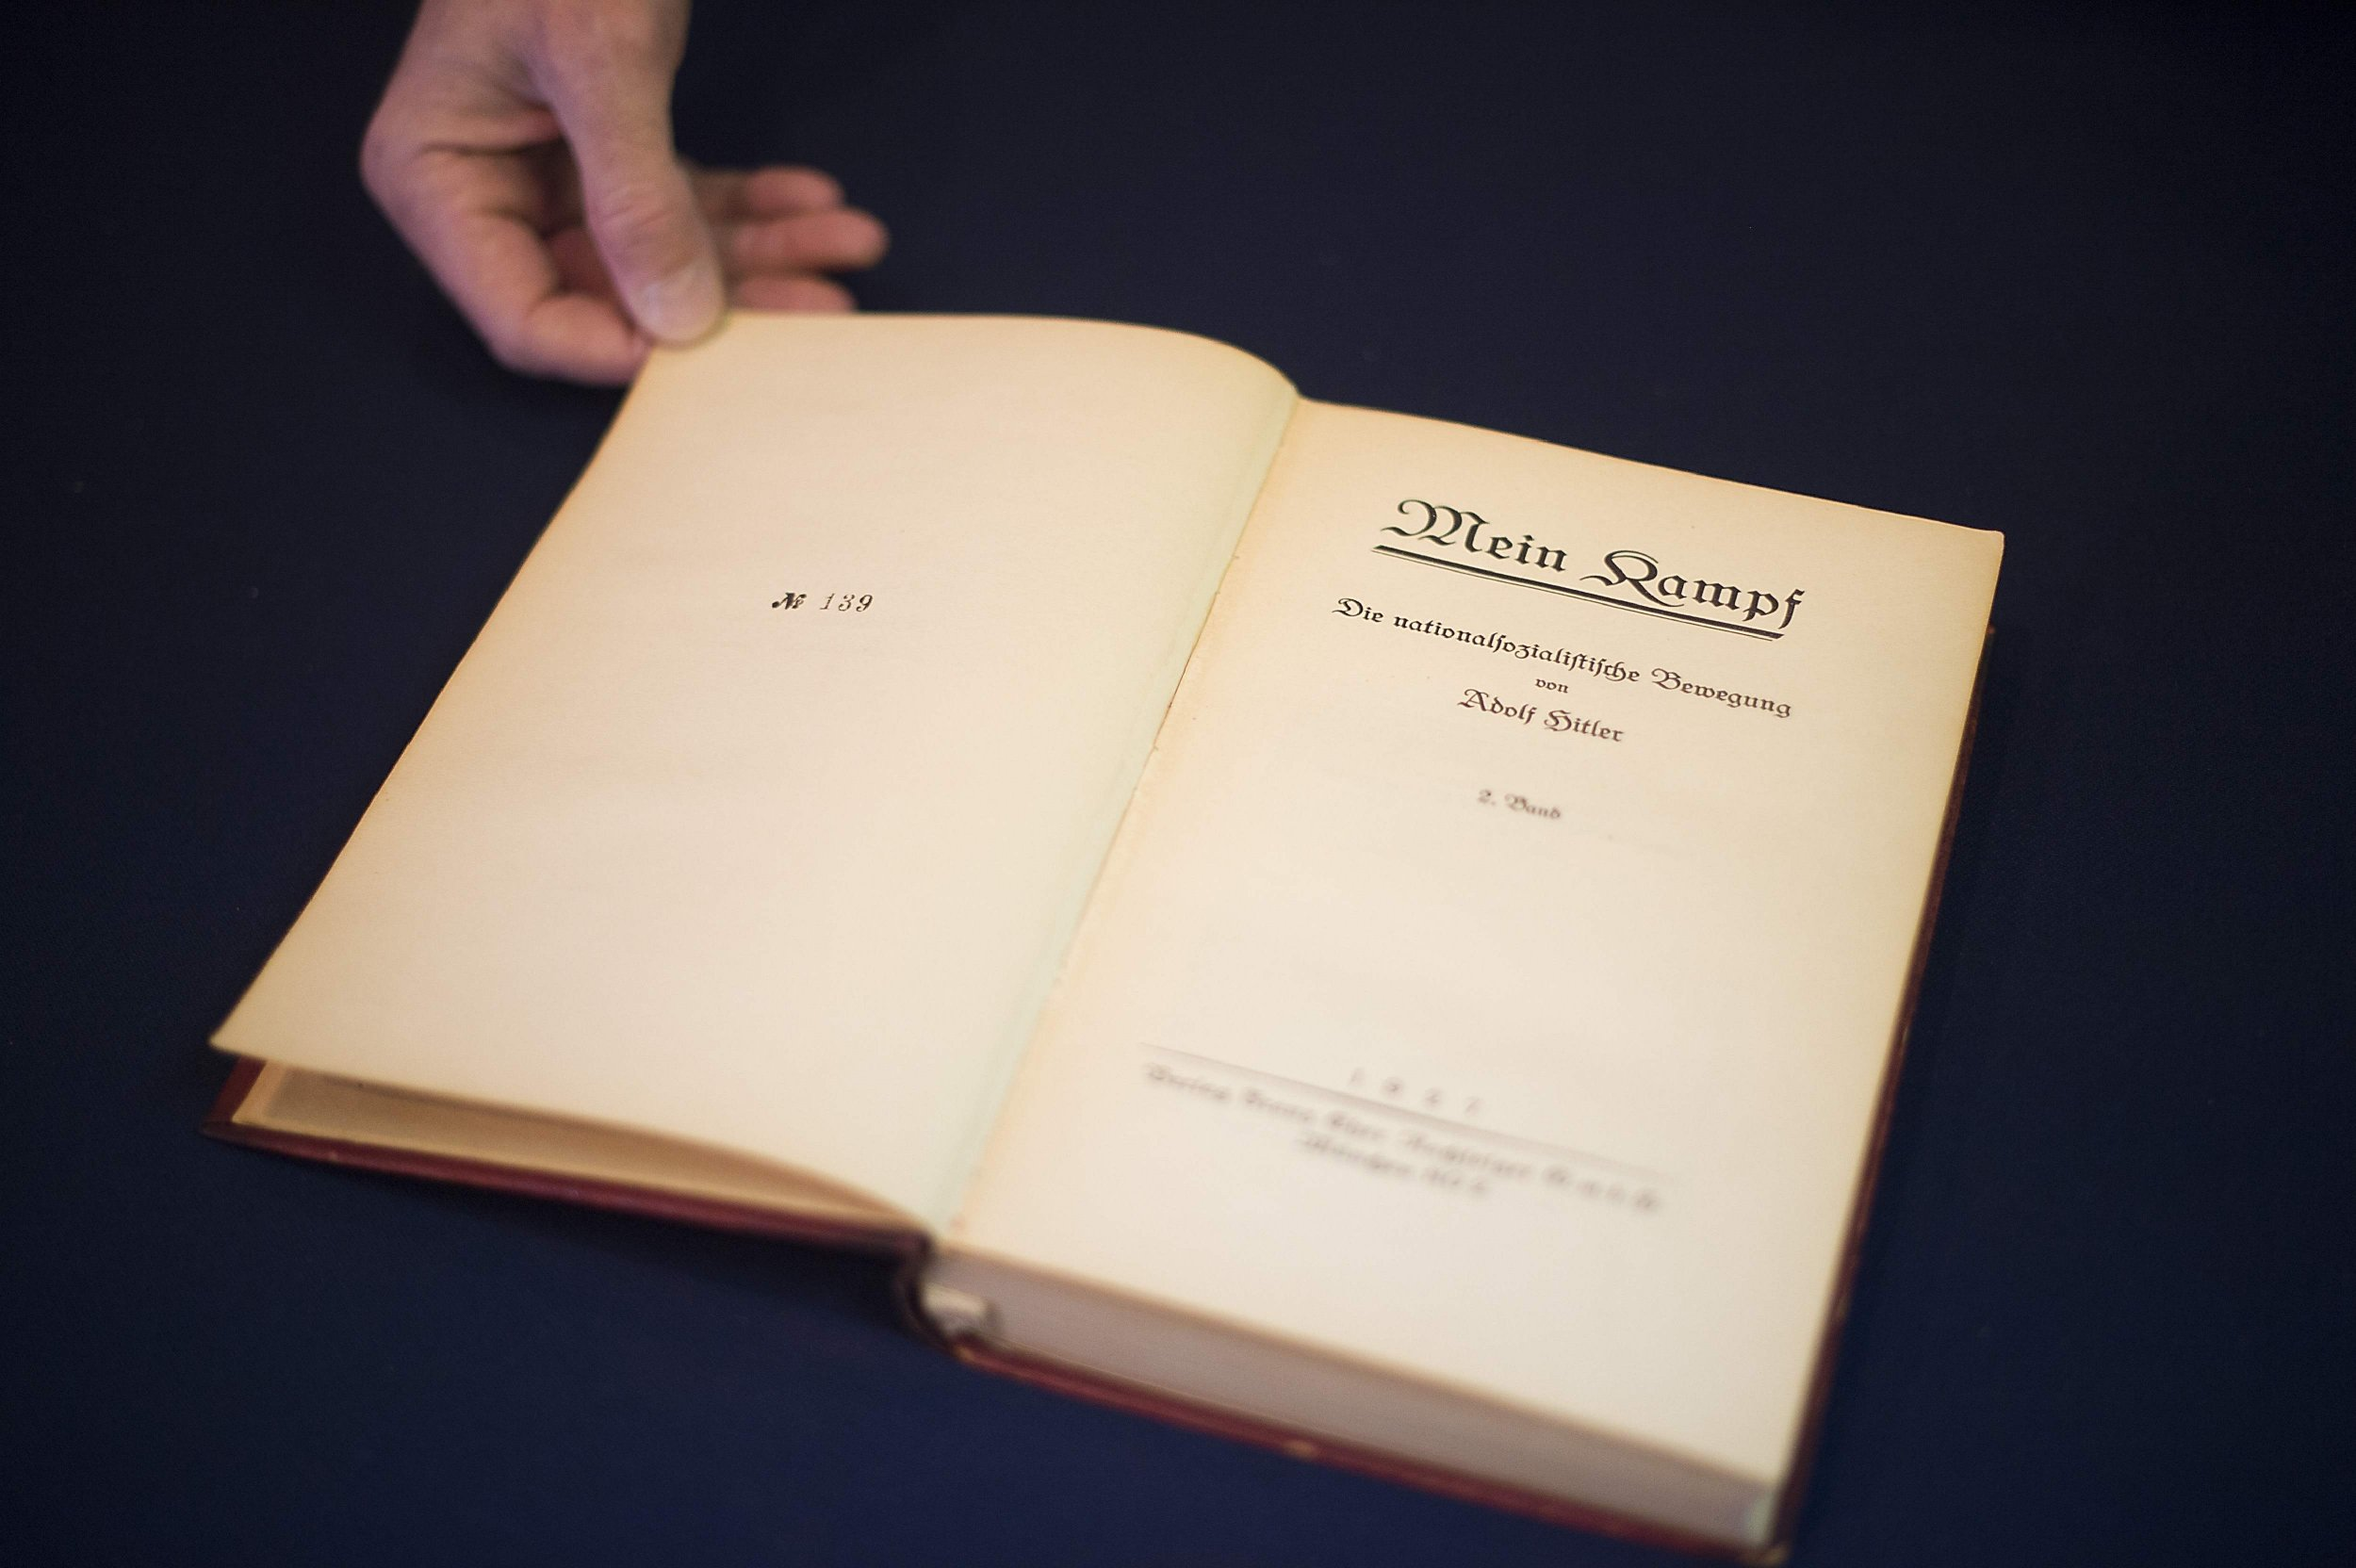 Adolf Hitler's copy of Mein Kampf sells for £14,273